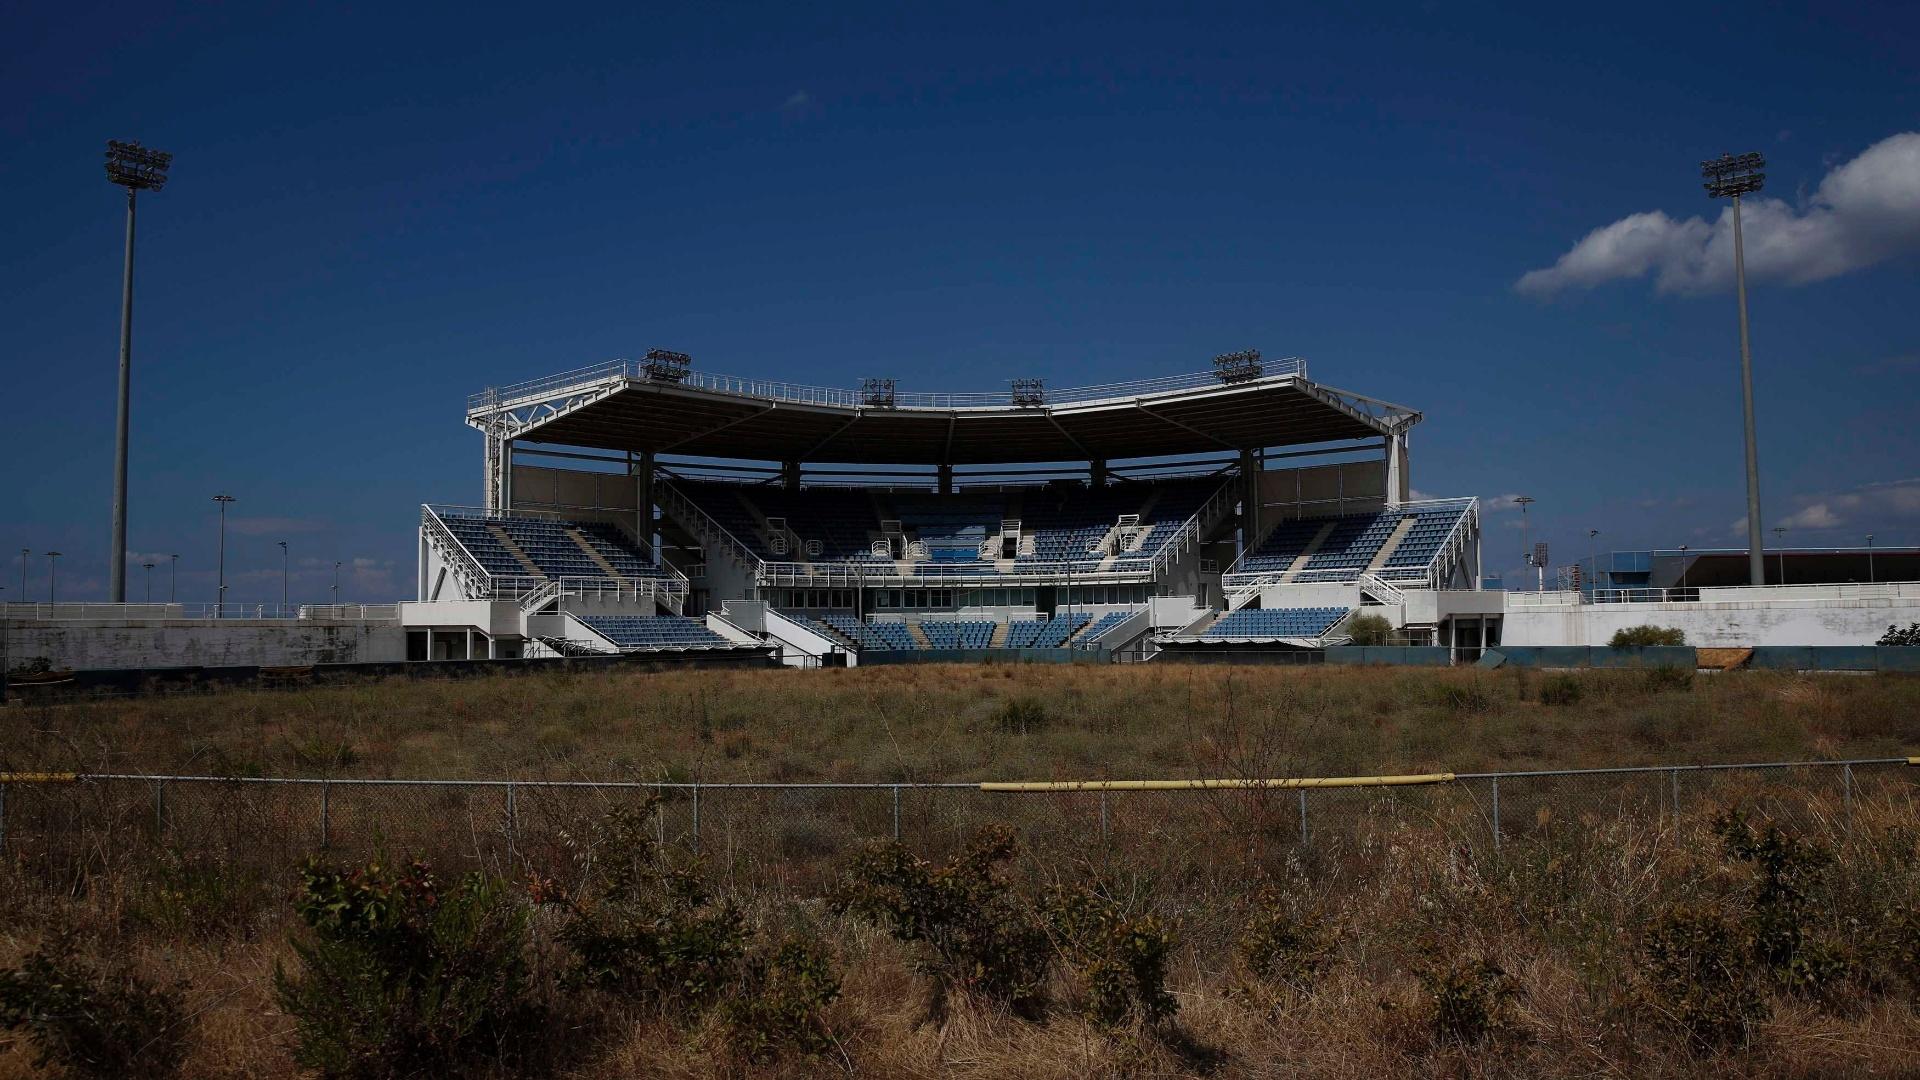 16.jul.2014 - Estádio que sediou os jogos de softbol é outra das estruturas usadas na Olimpíada de Atenas que está totalmente abandonada